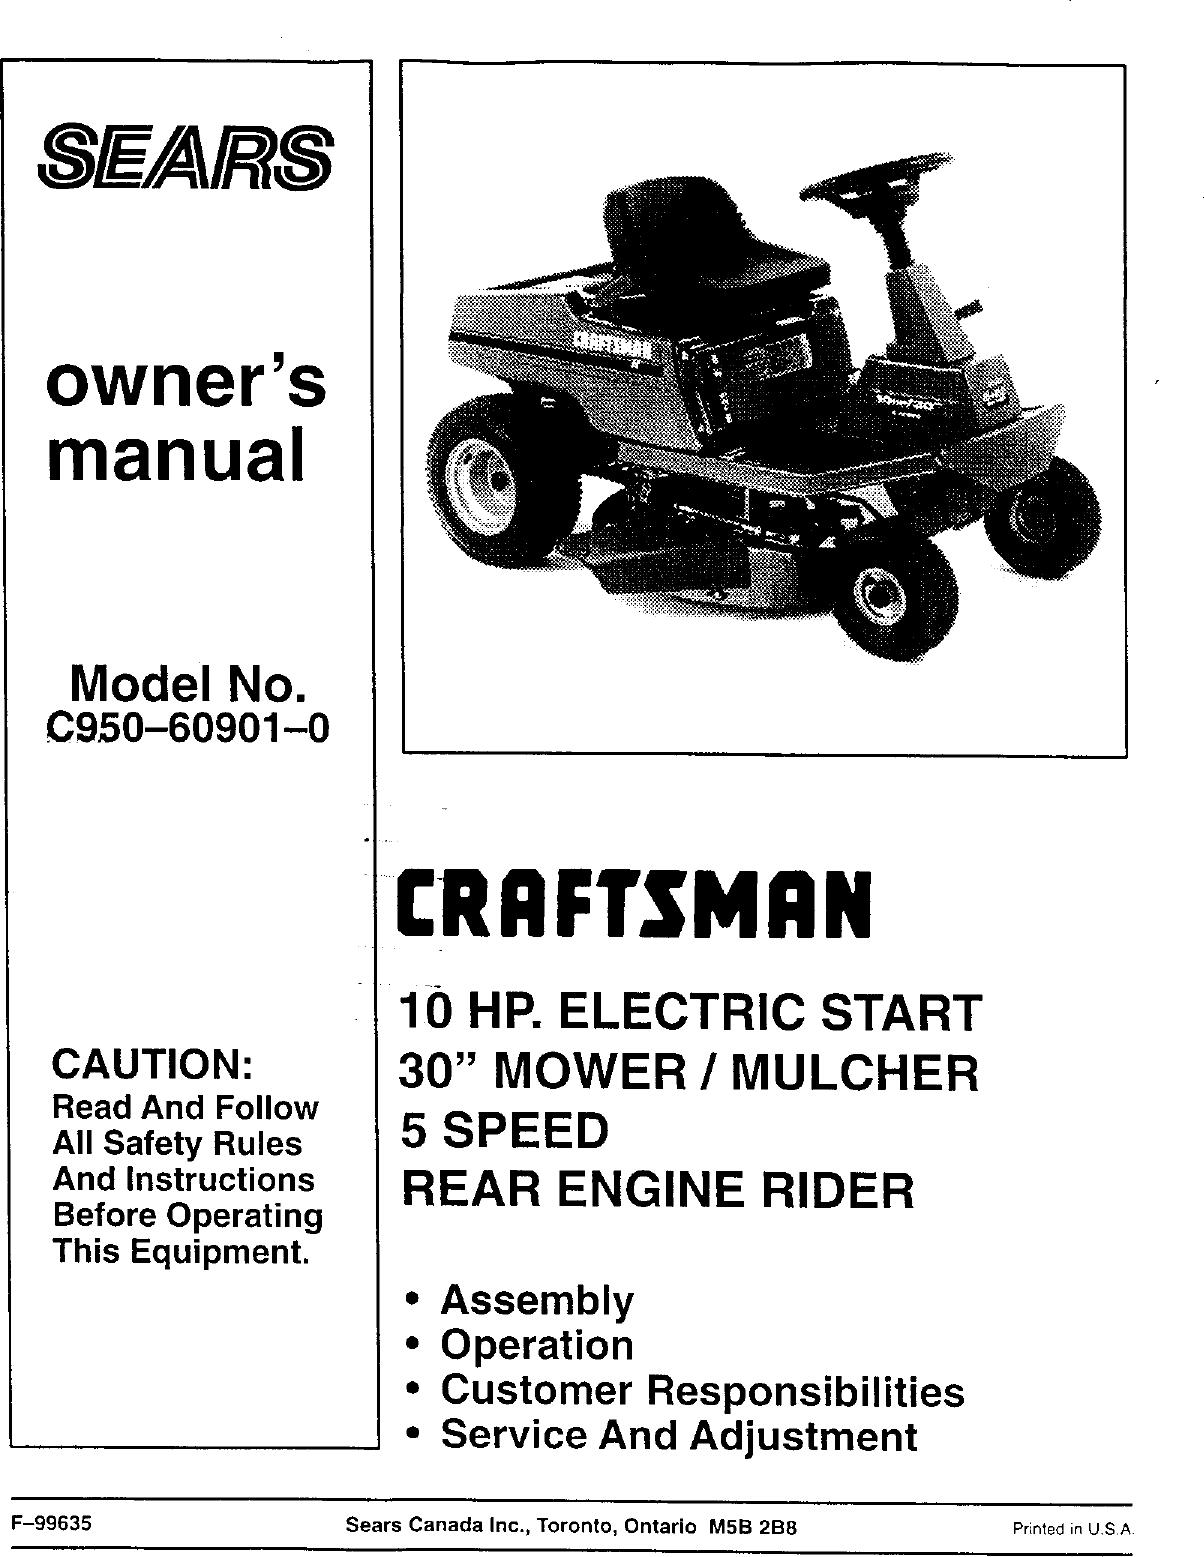 Craftsman C950 60901 0 User Manual SEARS/CANADA 10HP REAR